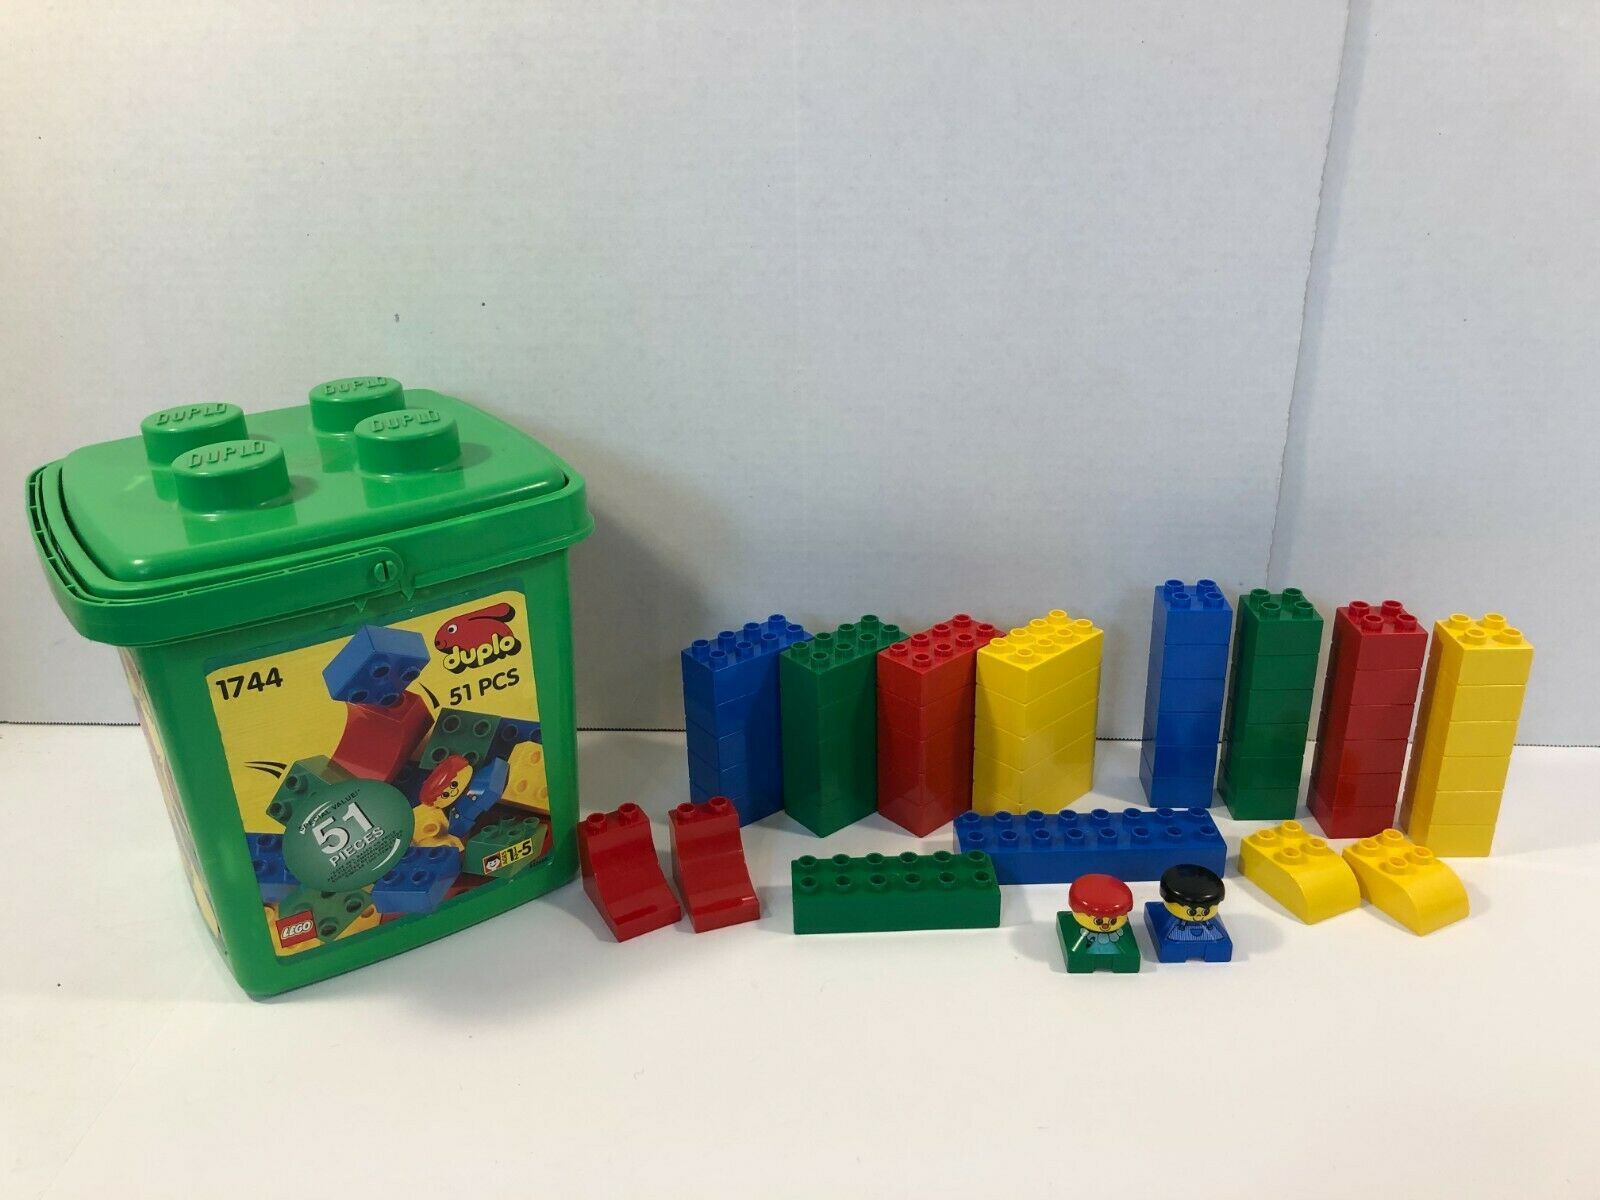 Lego Duplo 50 Pcs Limette Stones 2x2 Lime 4 Nubs Stone Building Bricks New